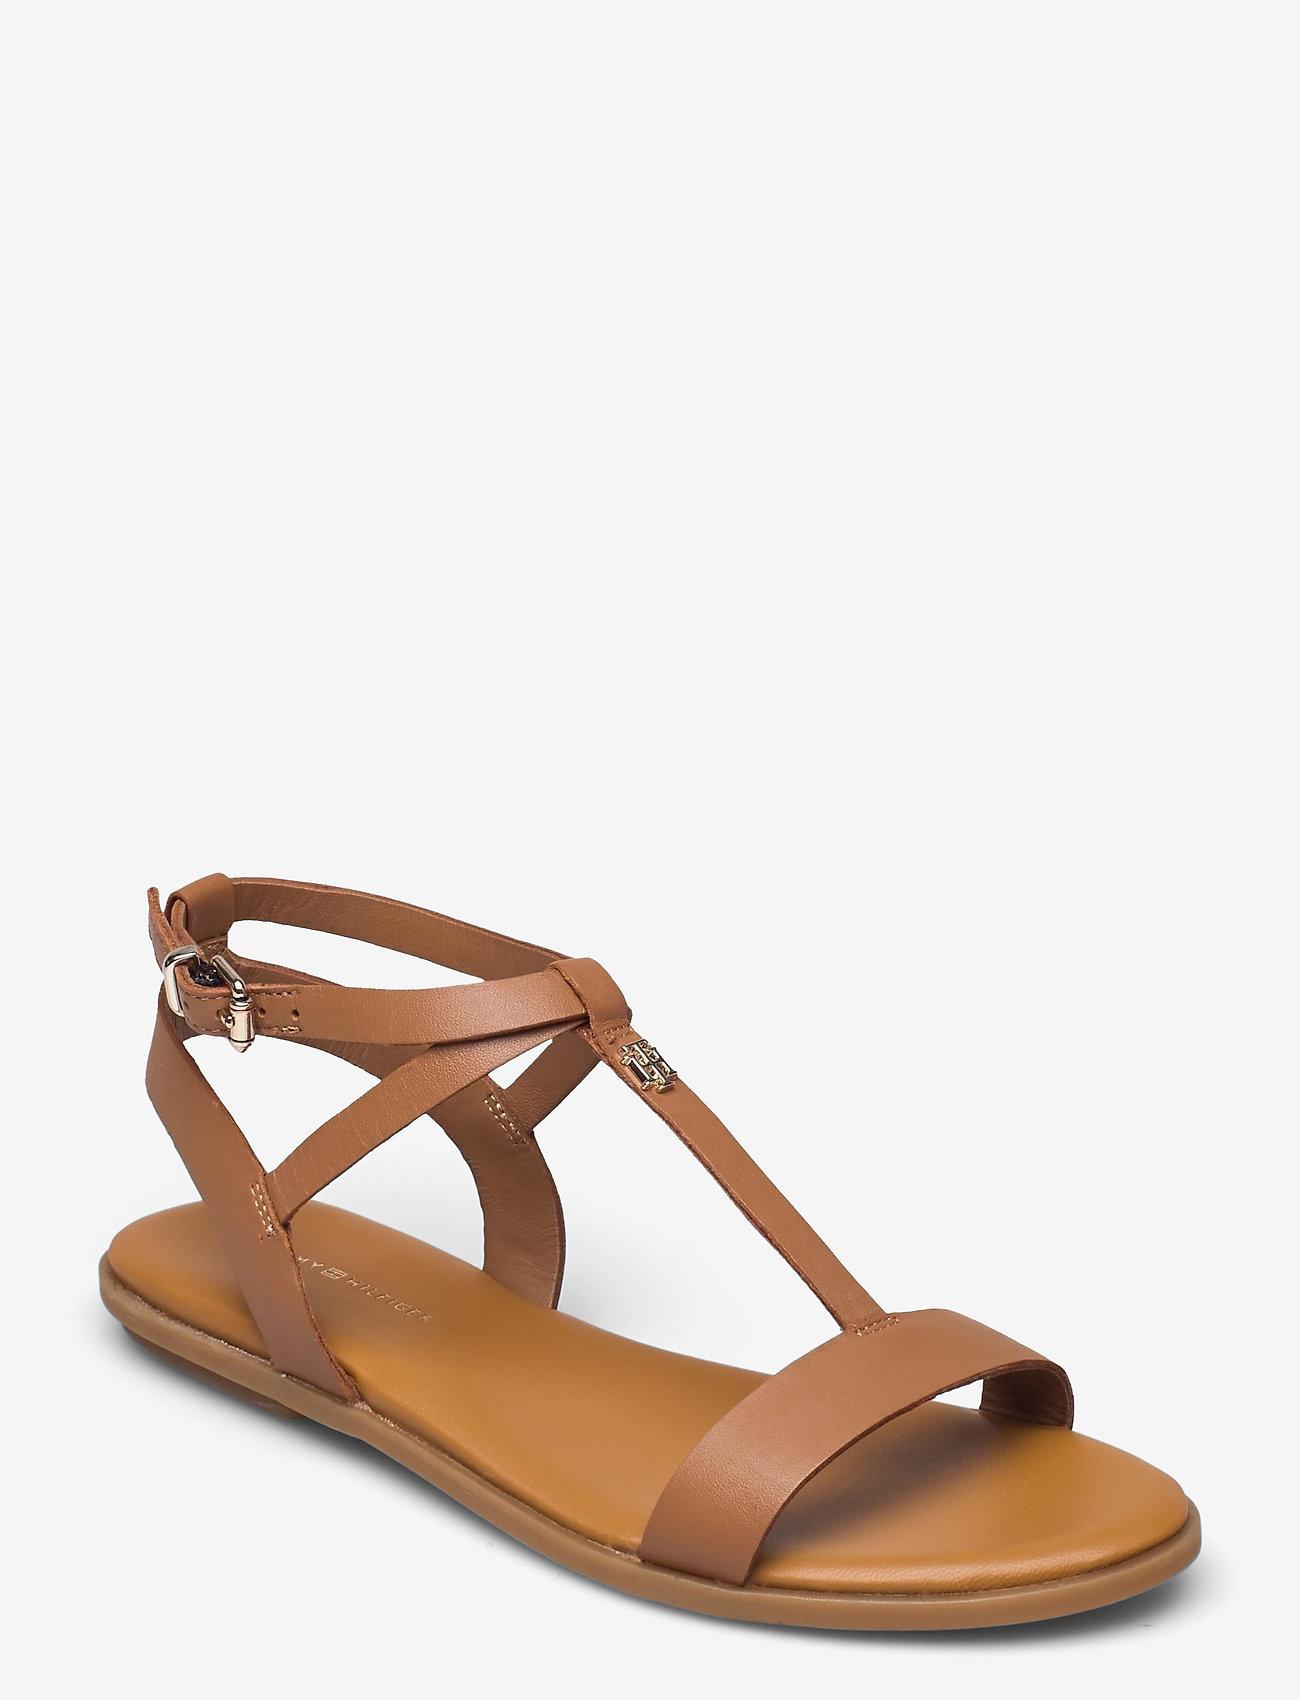 Tommy Hilfiger - FEMININE LEATHER FLAT SANDAL - flat sandals - summer cognac - 0